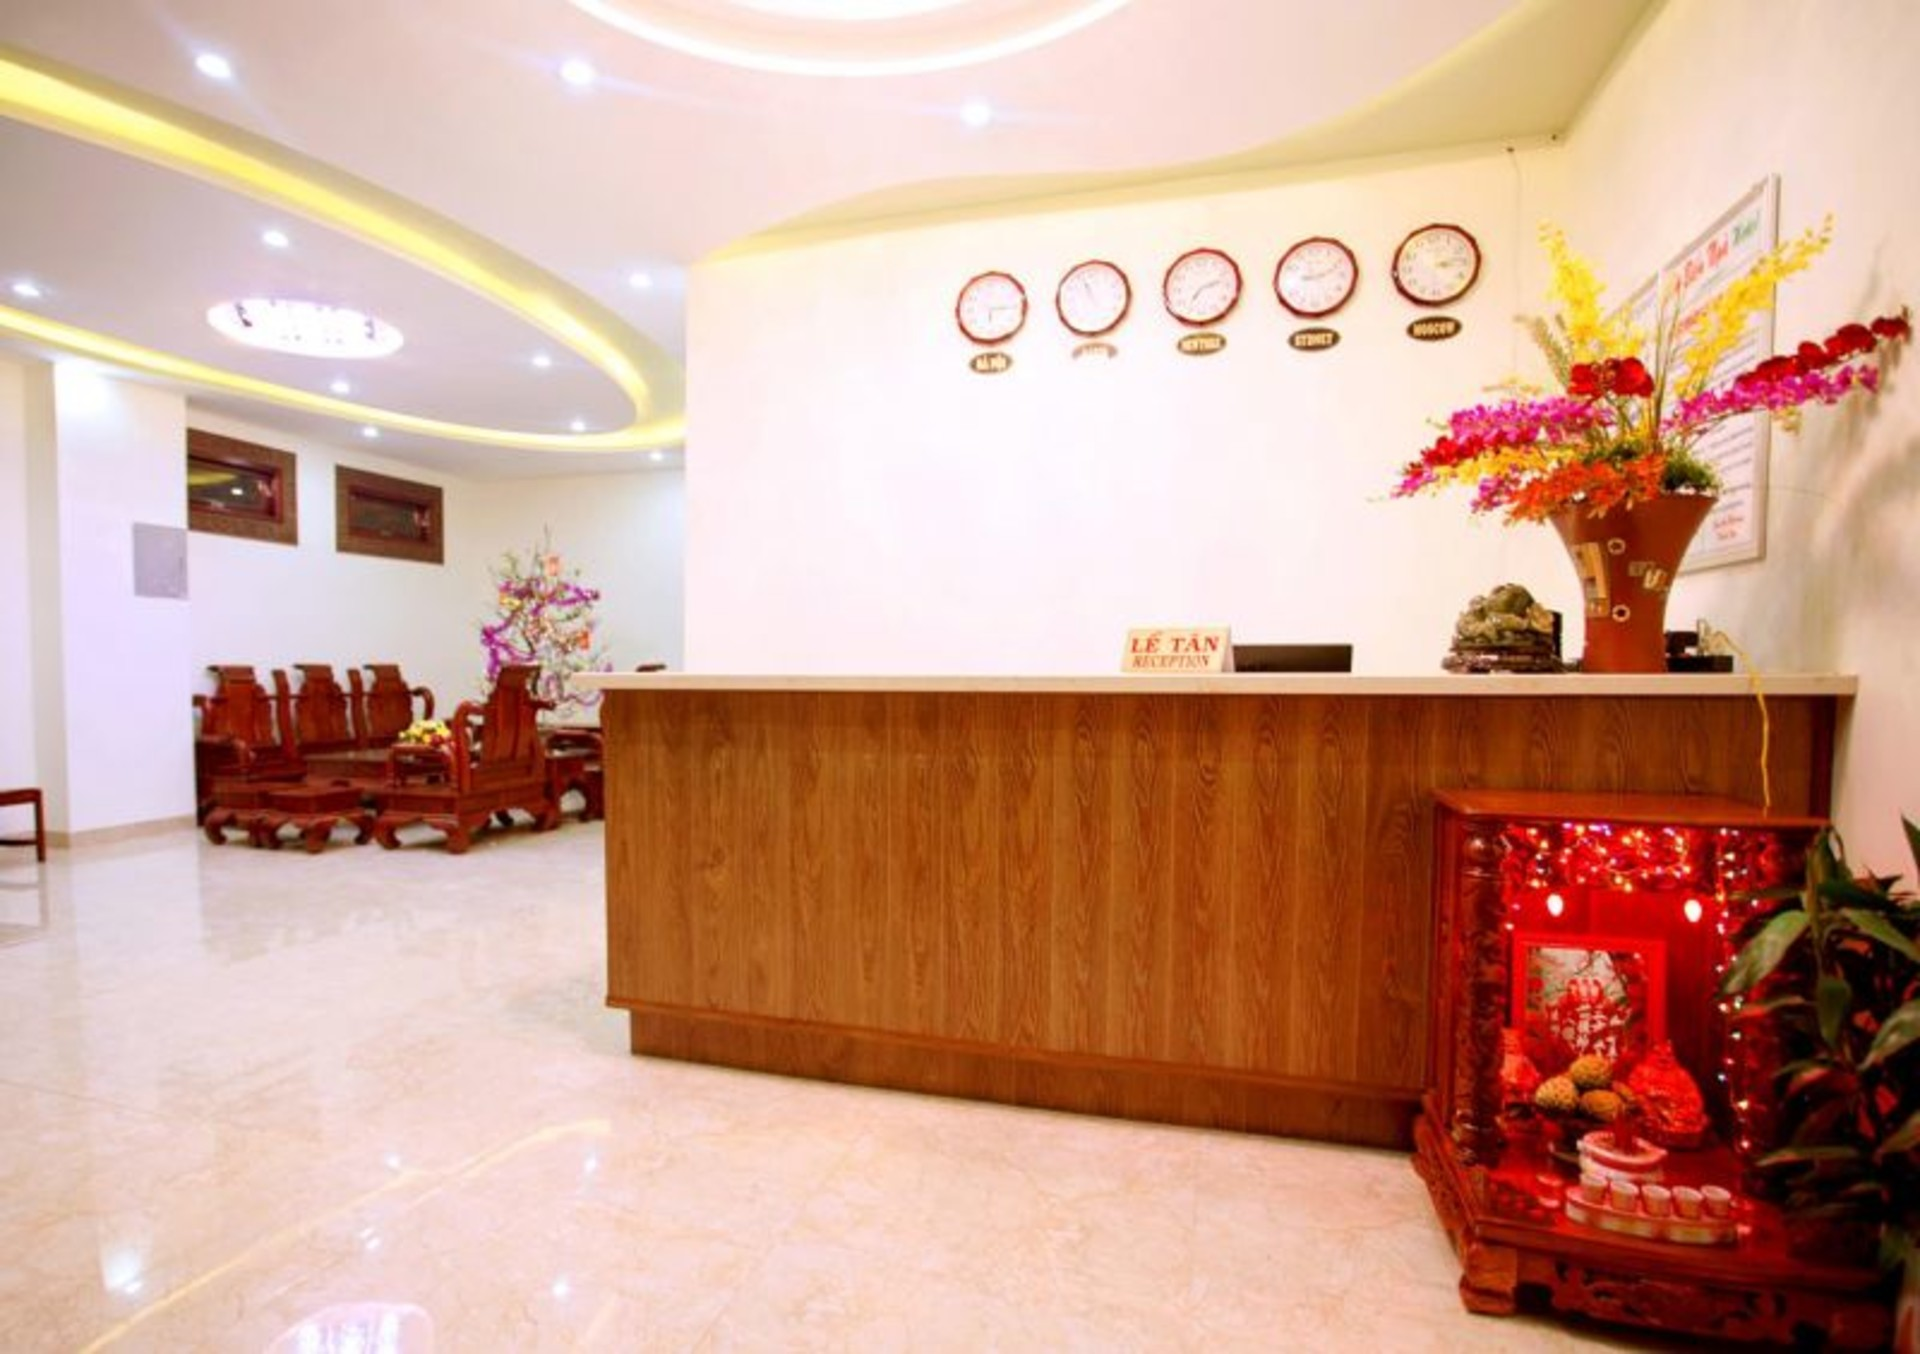 ivory-coast-hotel-100.jpg